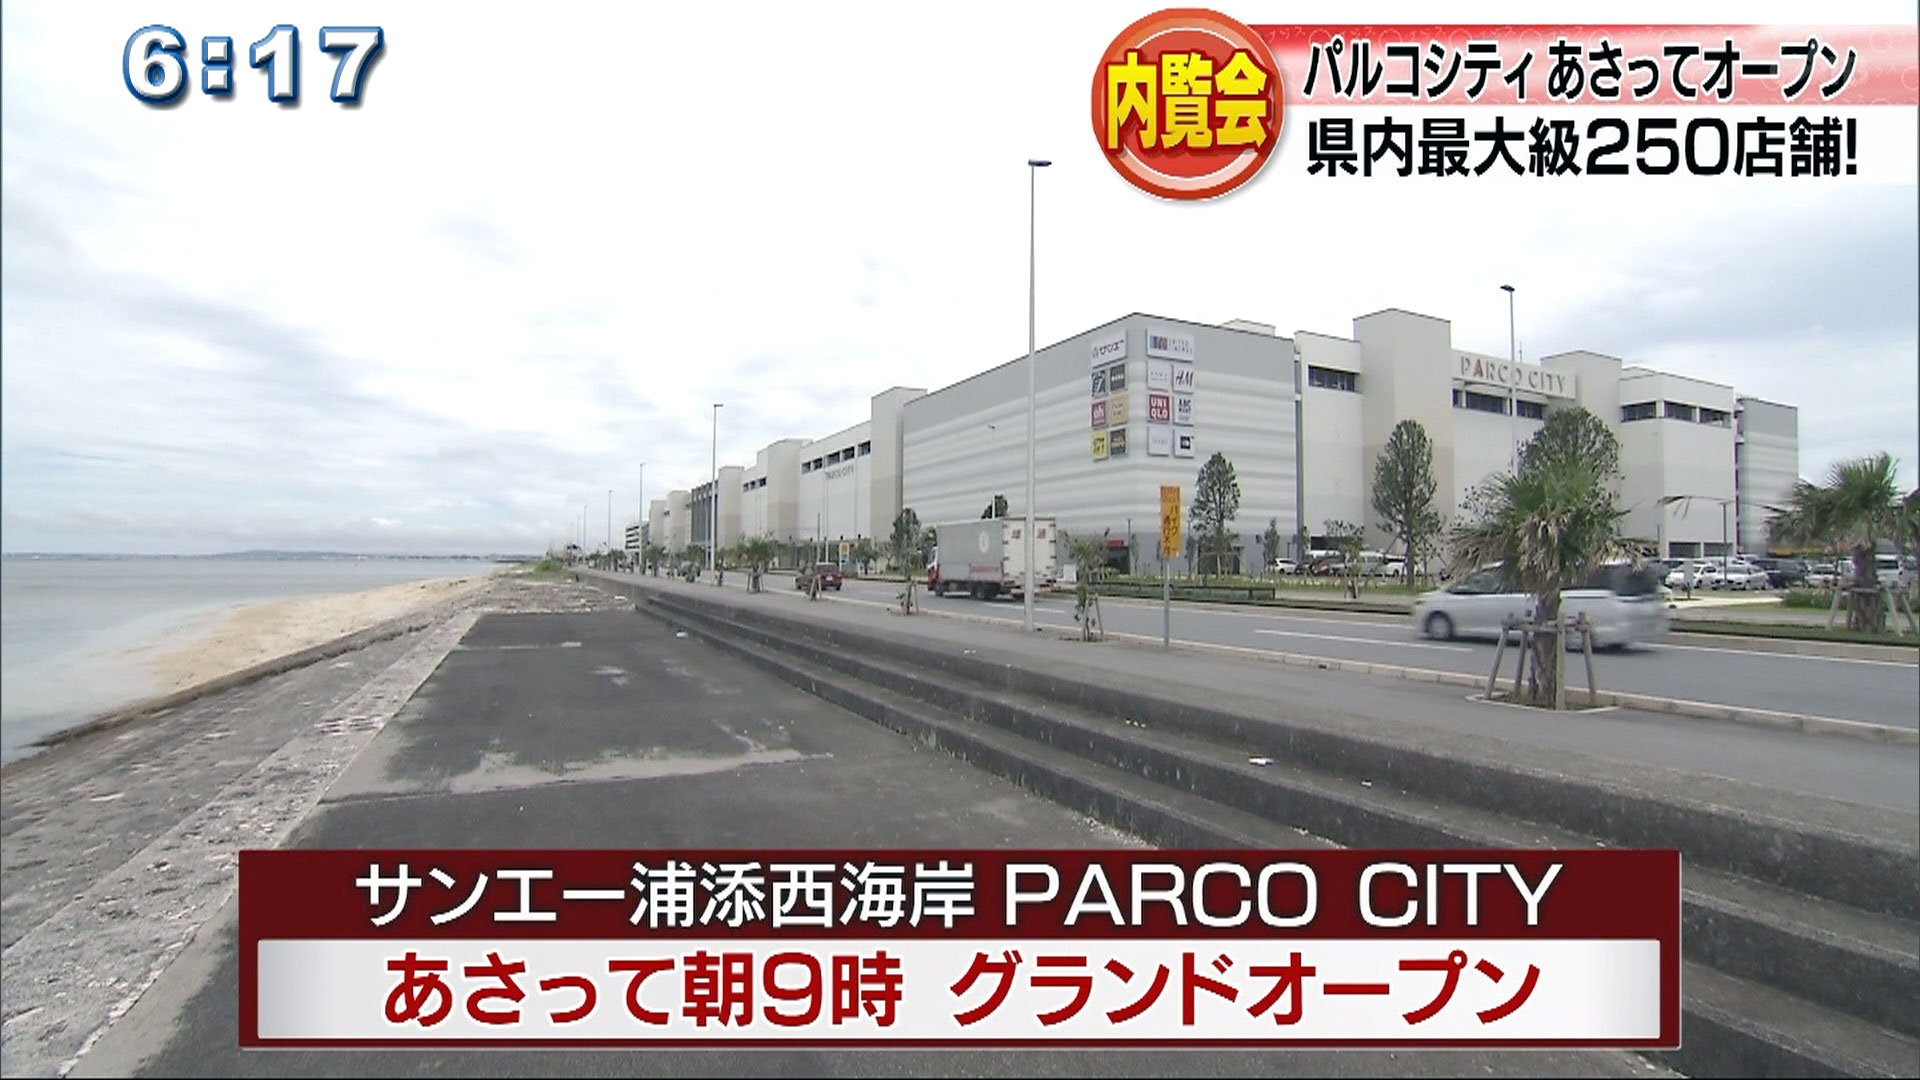 サンエー浦添西海岸PARCO CITY全貌公開